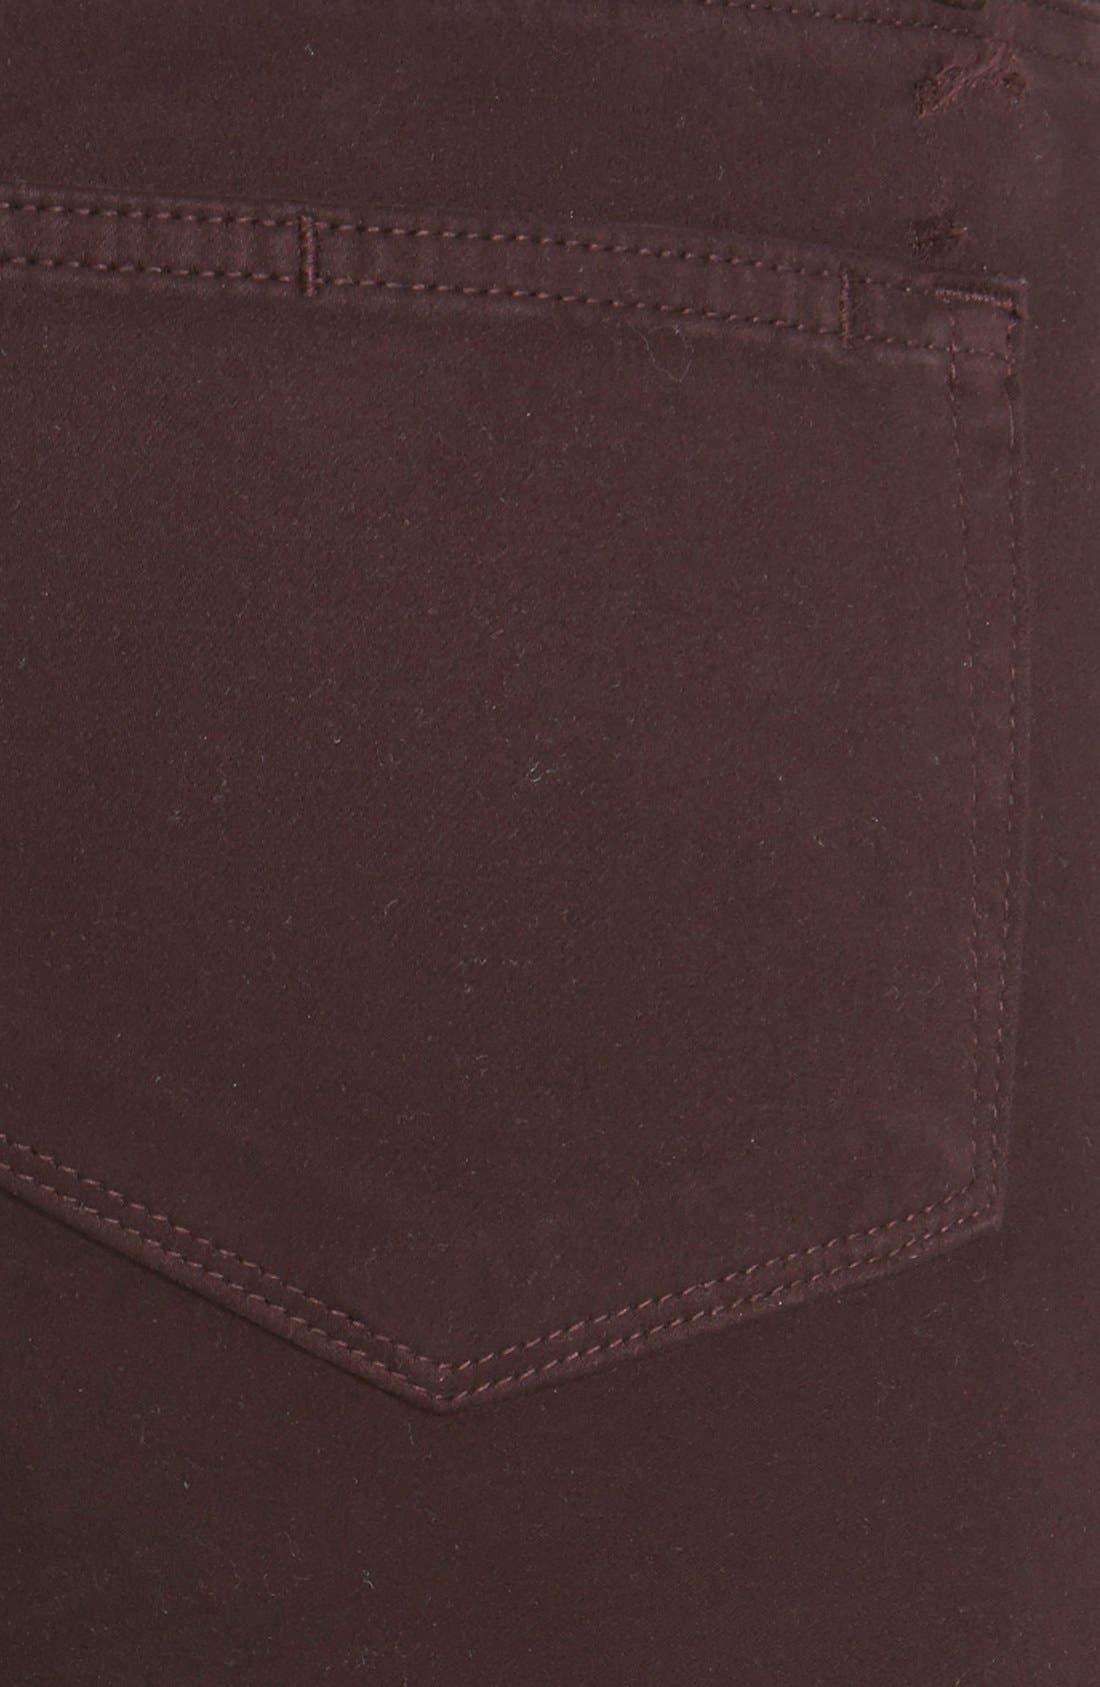 Alternate Image 3  - Paige Denim 'Verdugo' Ultra Skinny Jeans (Dark Wine)